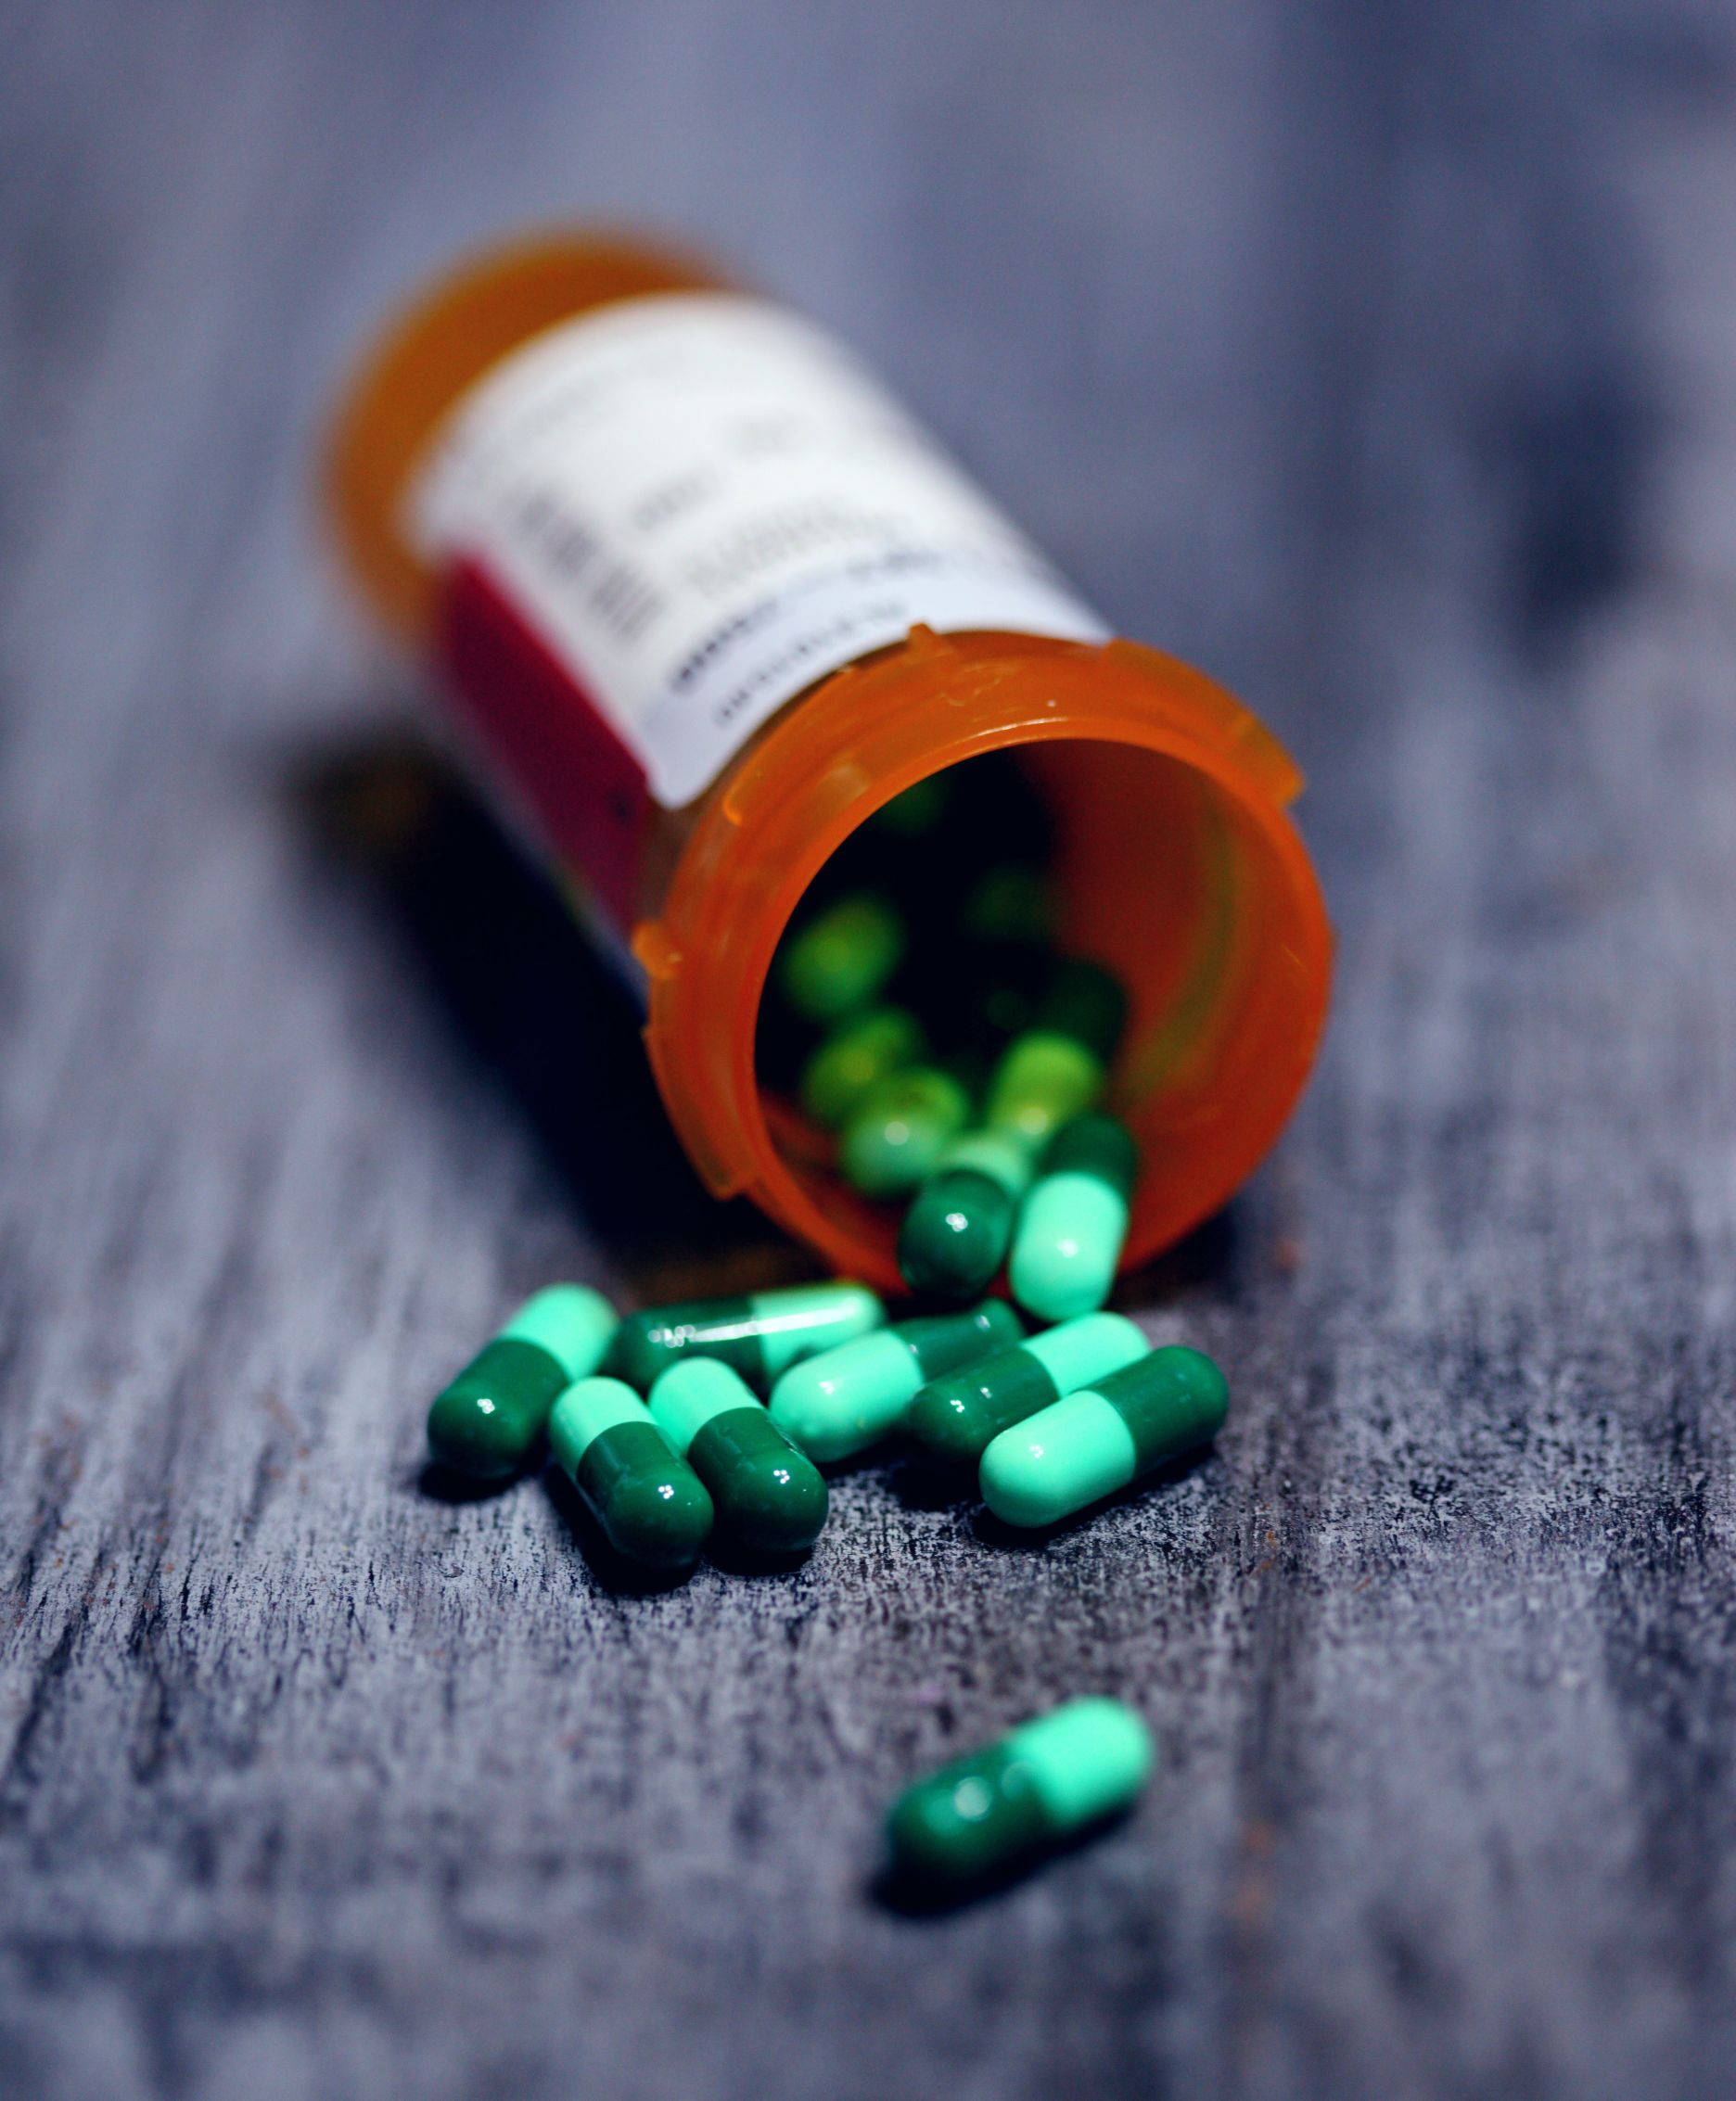 Opioid and Prescription Drug Abuse